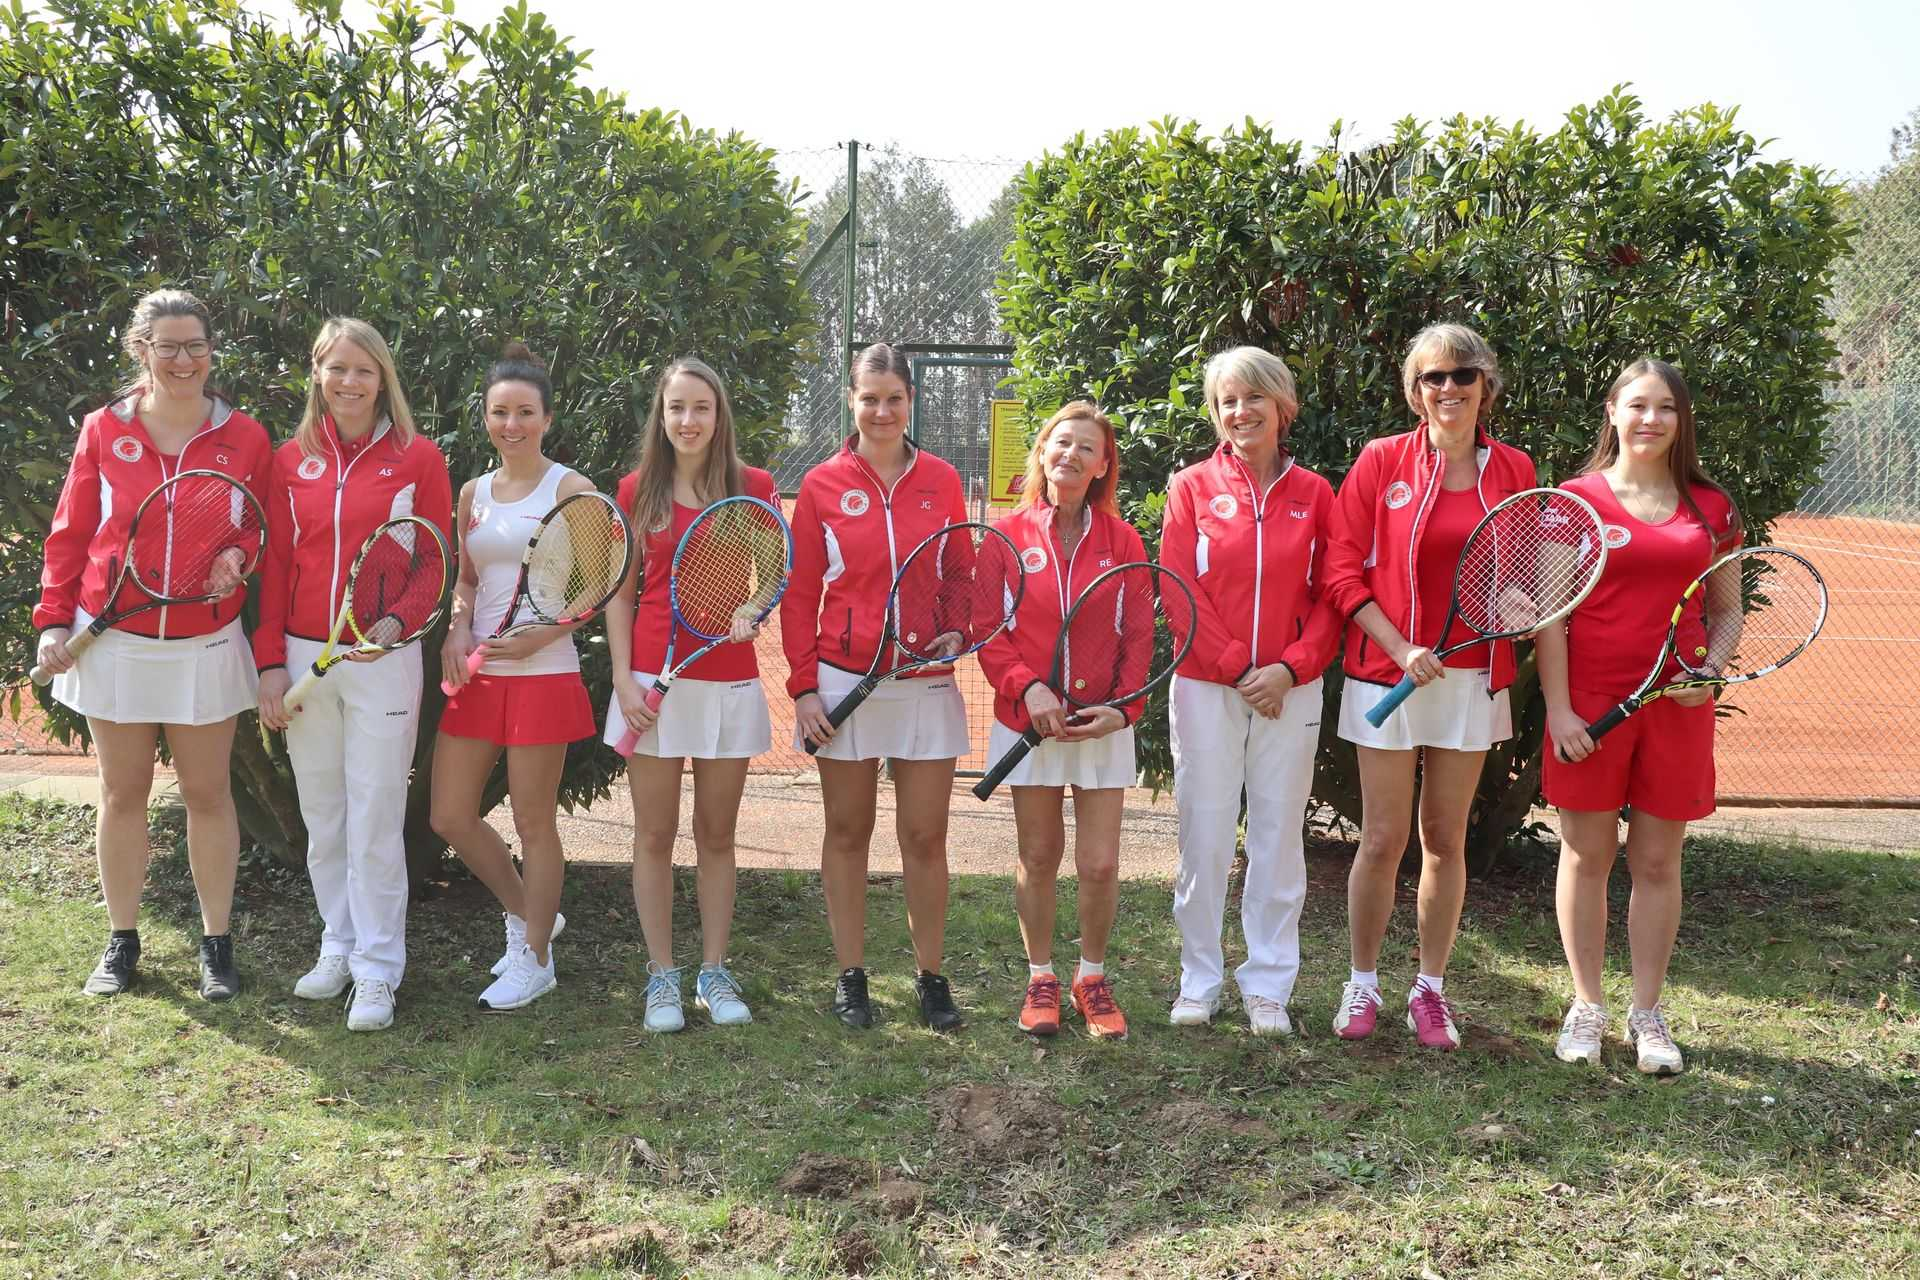 Tennisverein Kenzingen manschafte 11